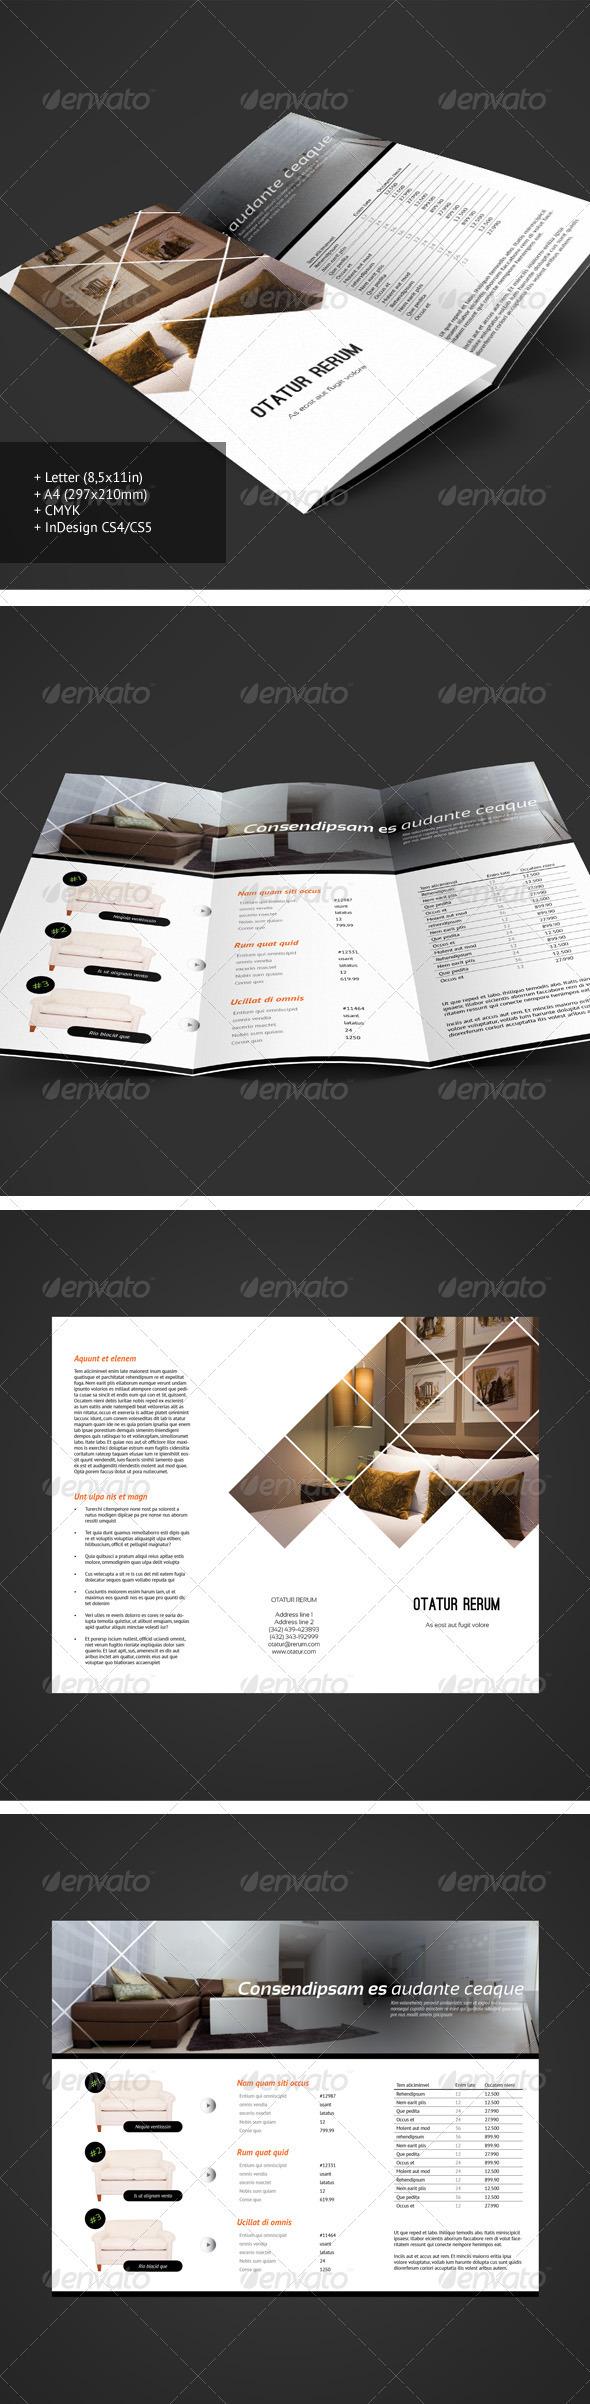 Tri-fold Brochure 9 - Informational Brochures